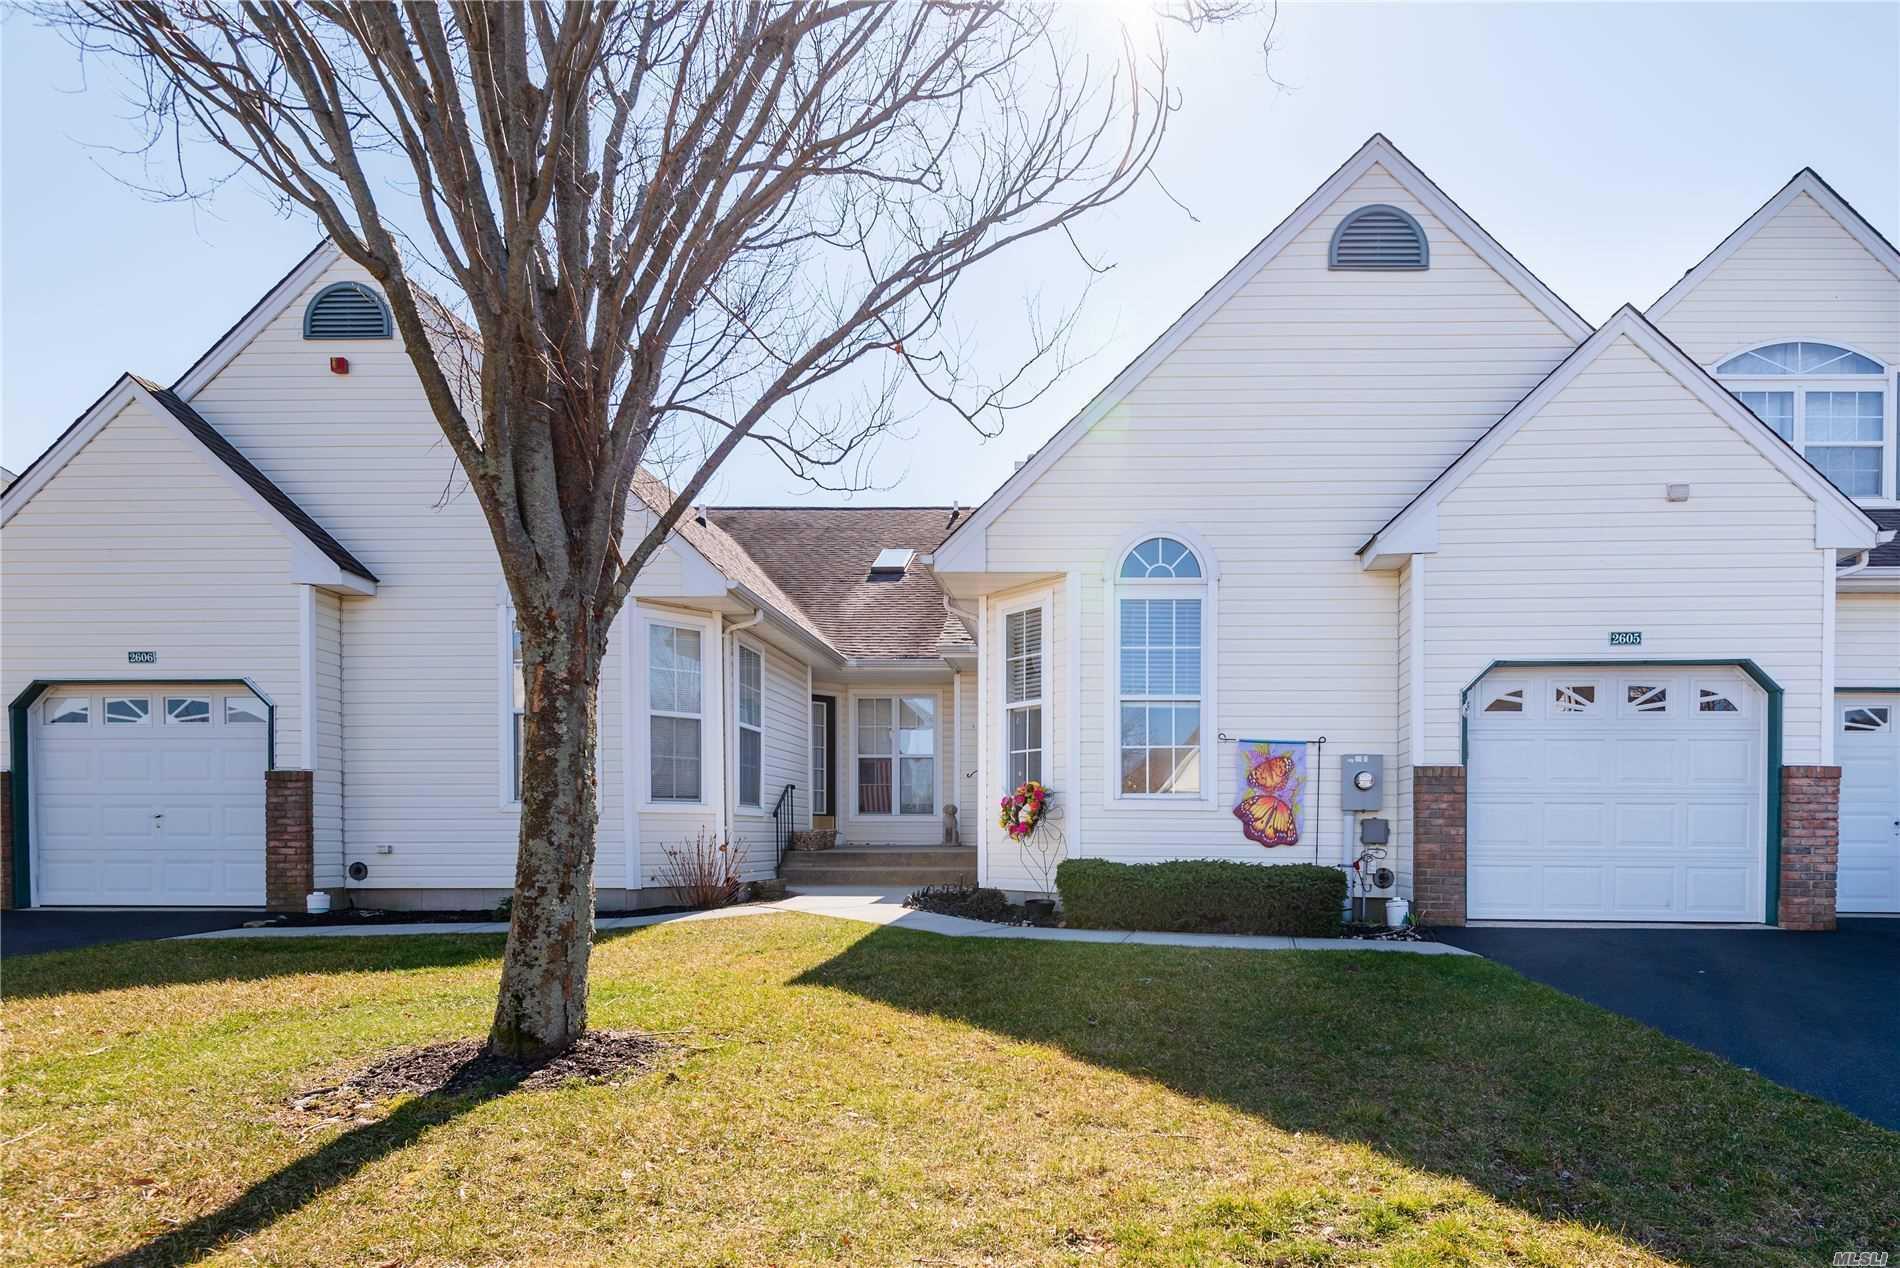 Property for sale at 2605 Eve Ann Drive, Pt.Jefferson Sta NY 11776, Pt.Jefferson Sta,  New York 11776